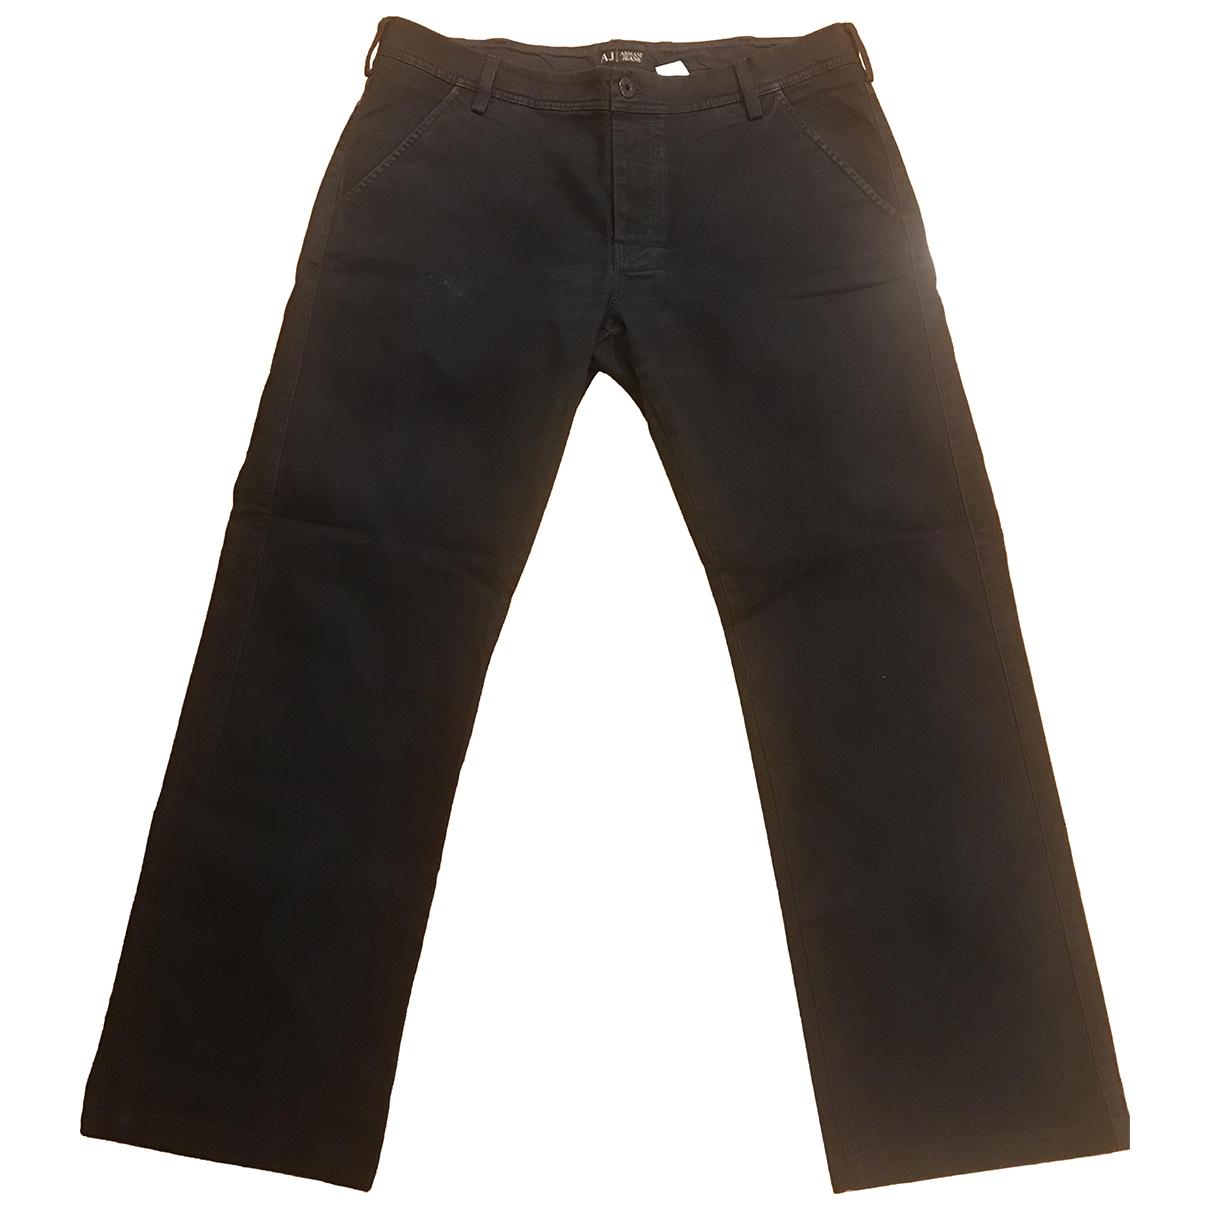 Armani Jeans \N Blue Denim - Jeans Trousers for Men 40 UK - US